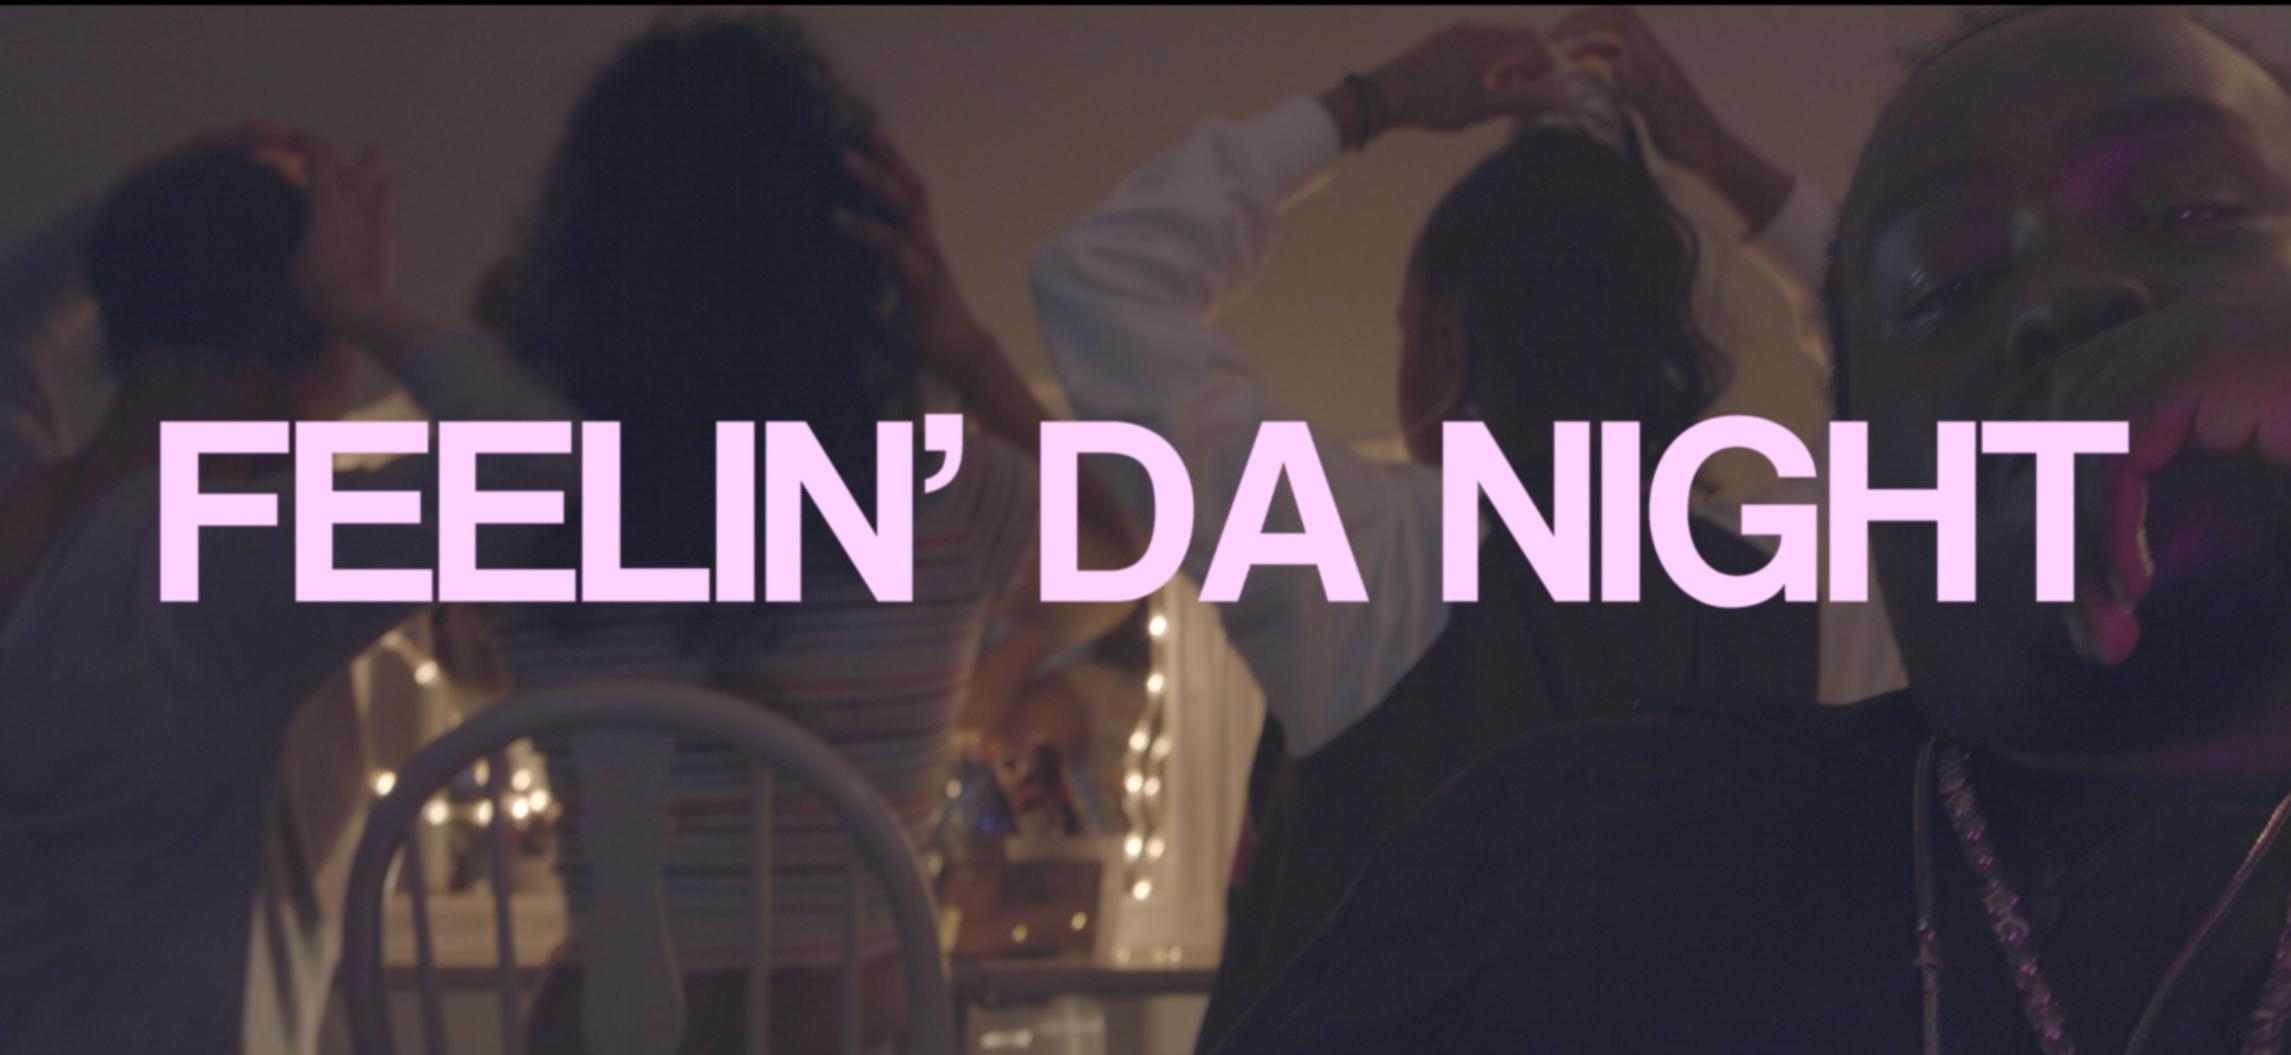 DC - FEELIN' DA NIGHT (PROD. KHORUS)